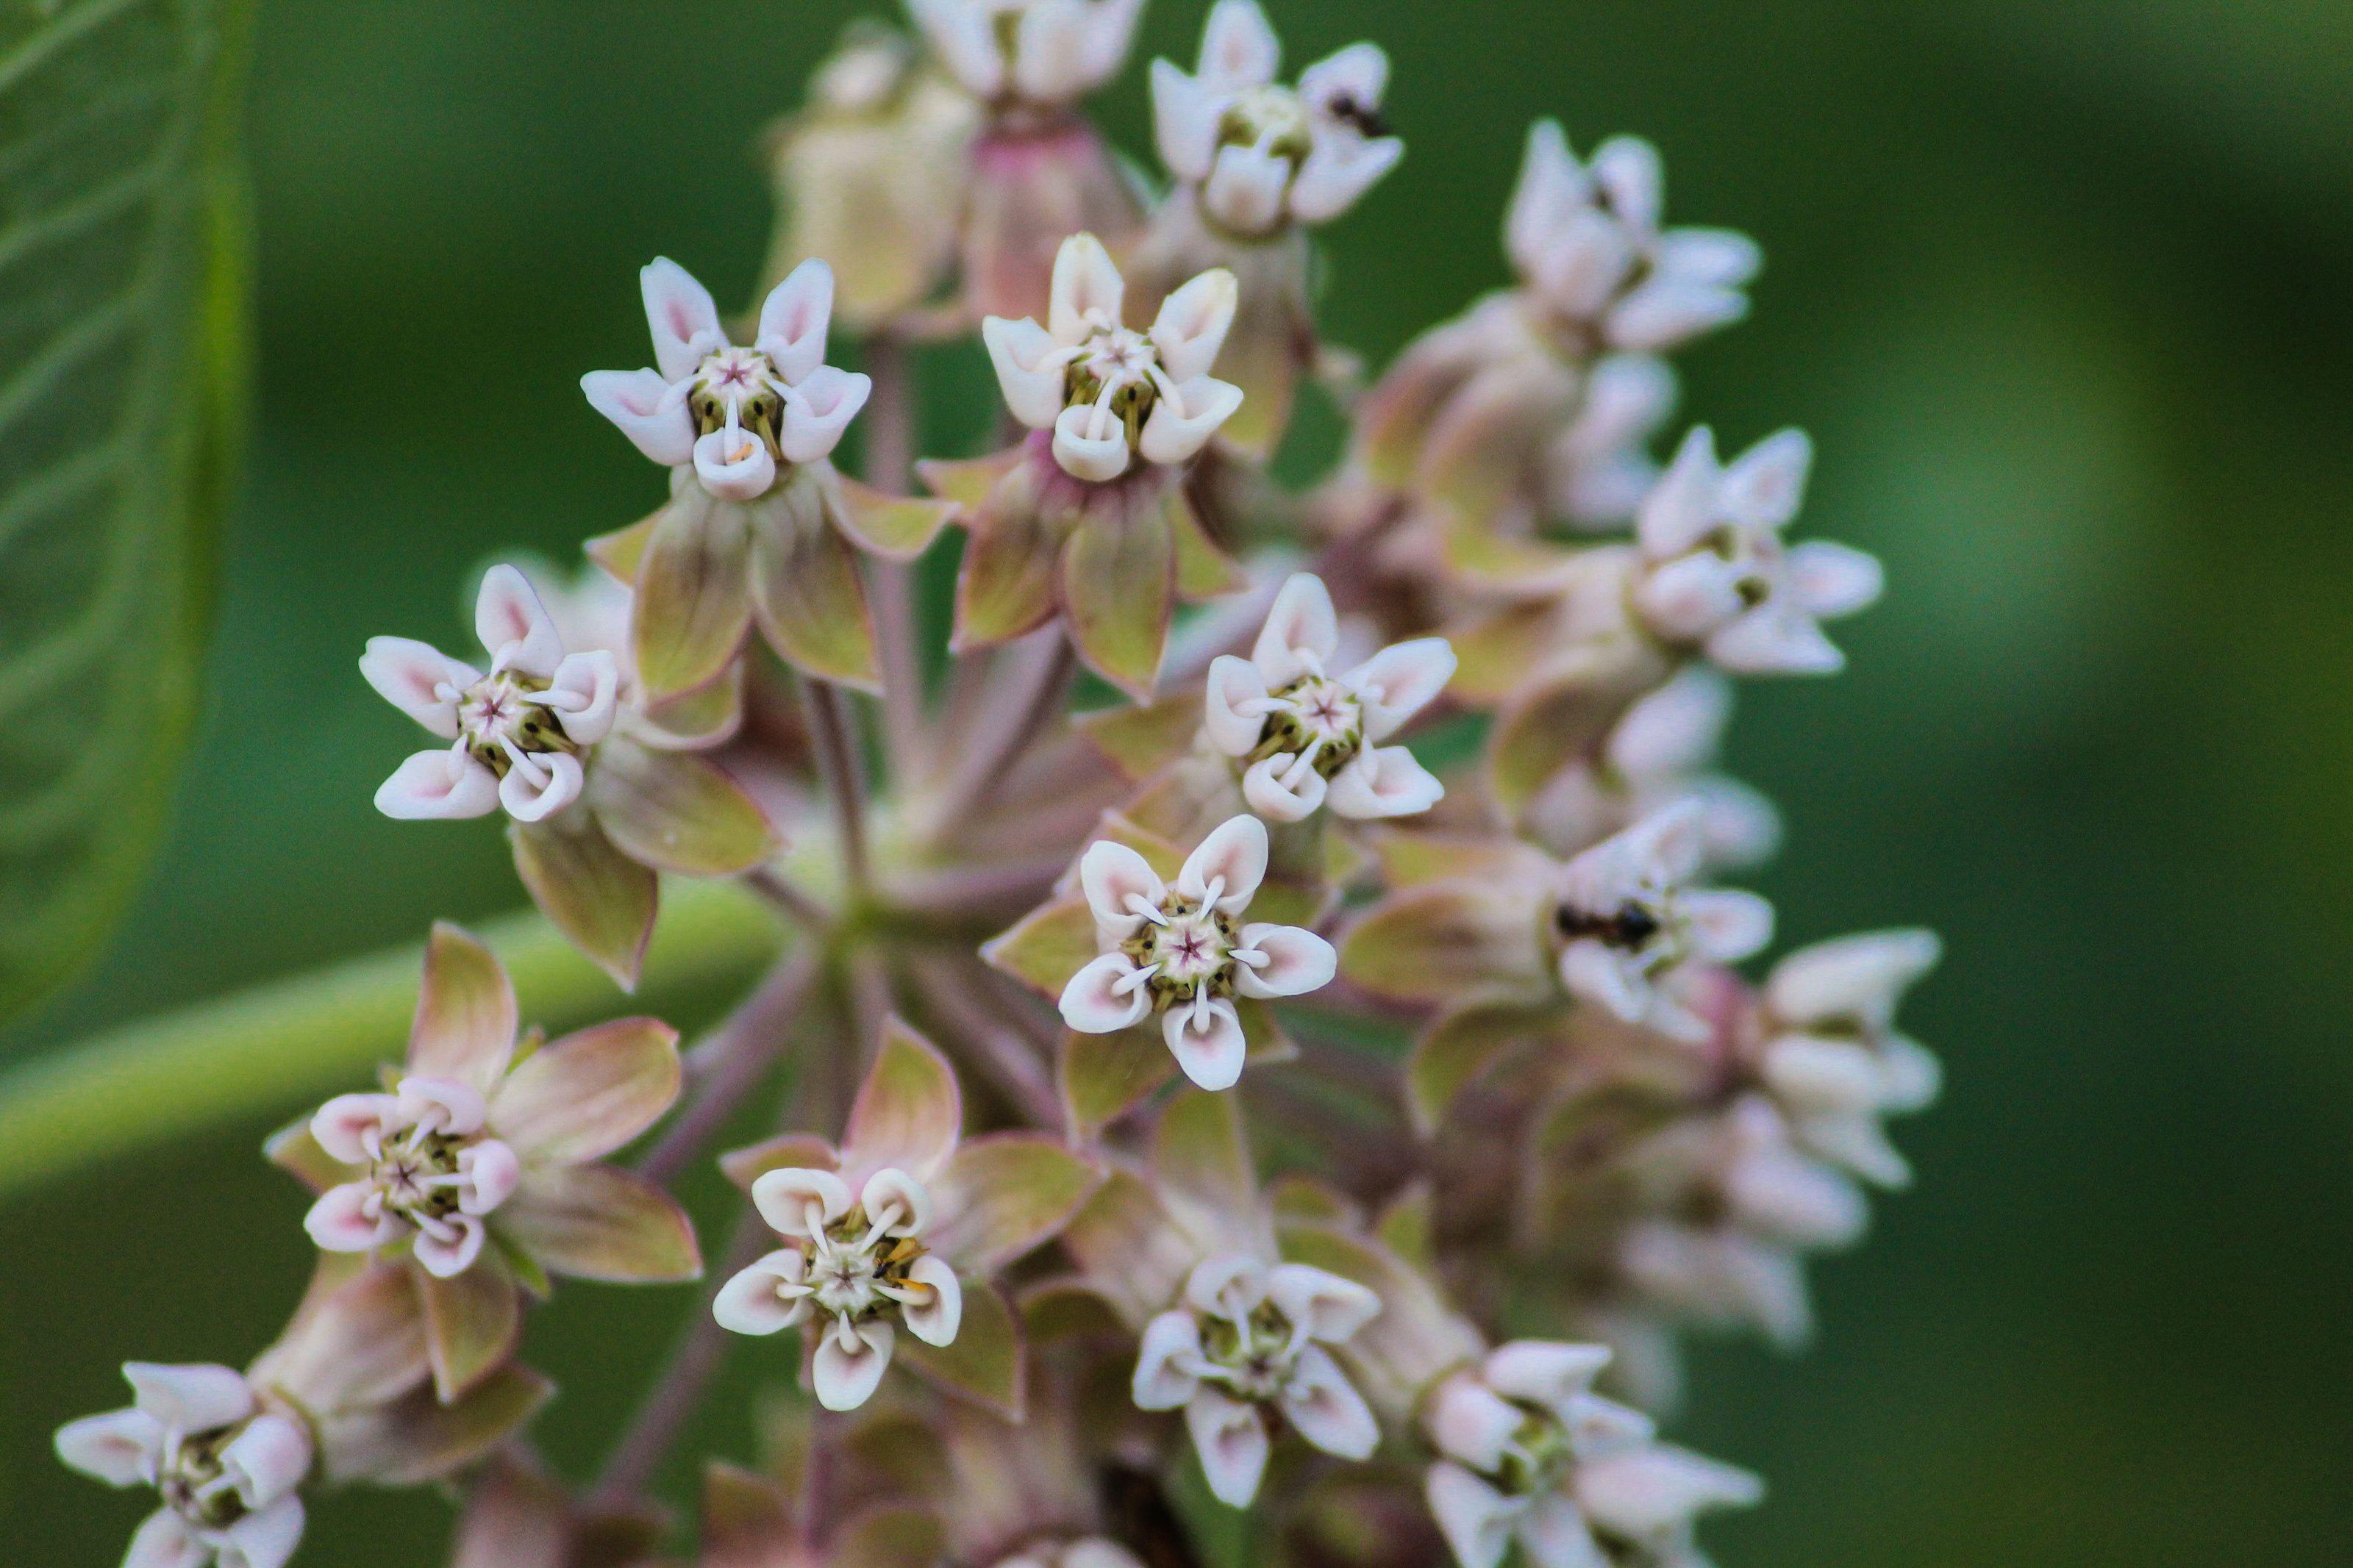 """Milkweed Blossoms"" by Pistos - Caedes Desktop Wallpaper"